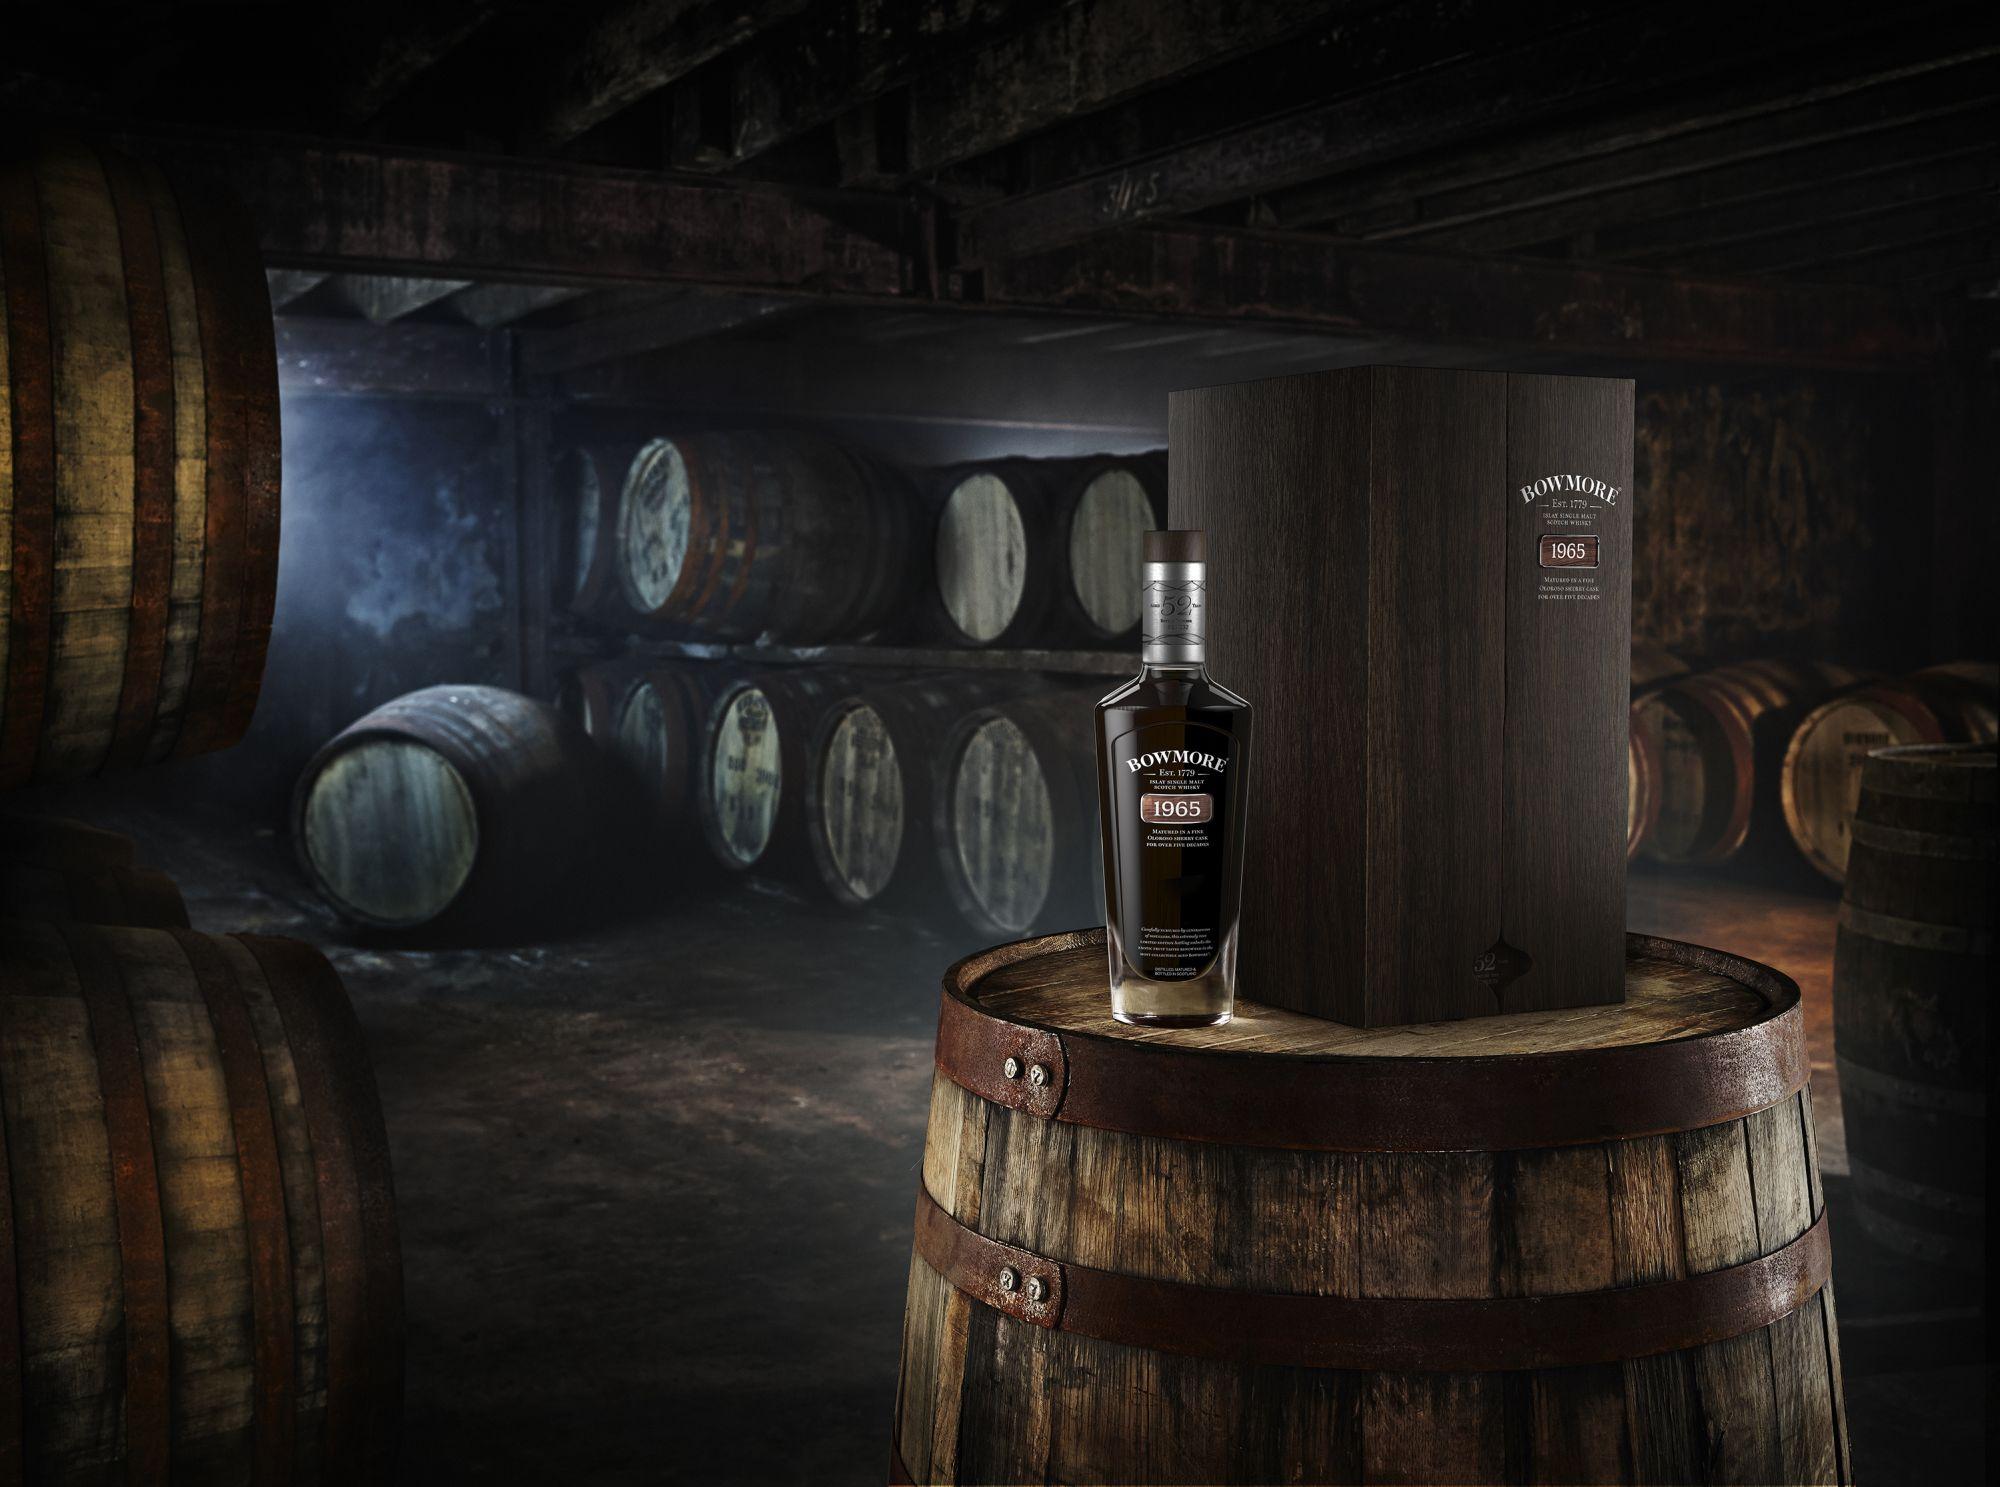 Bowmore 1965 Distillery Barrel JPG